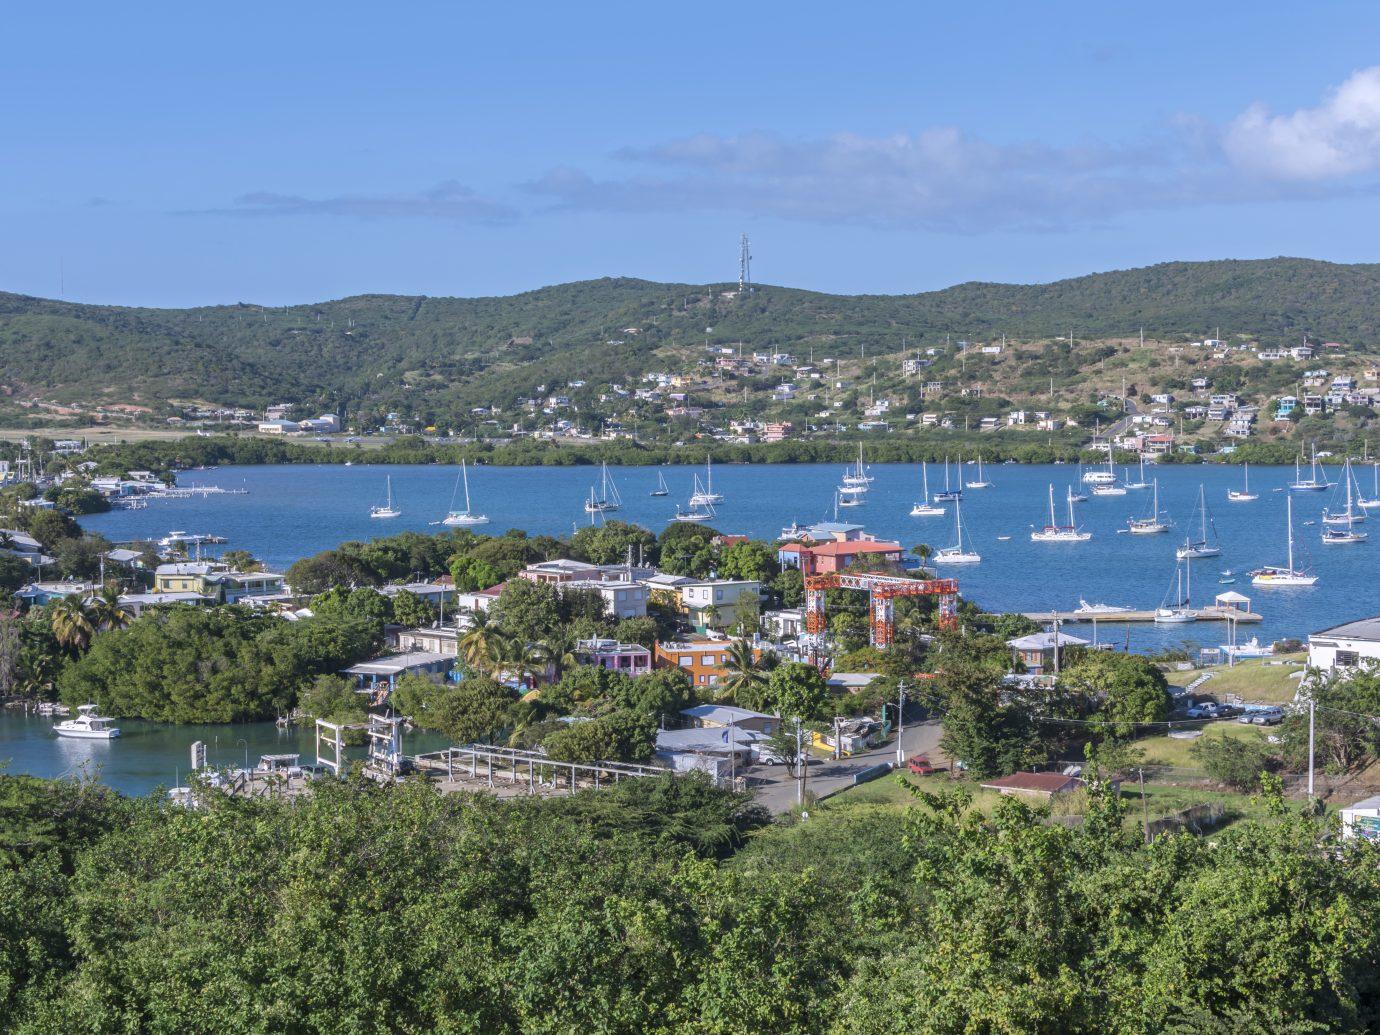 Puerto Rican island of Isla Culebra in the Caribbean Sea